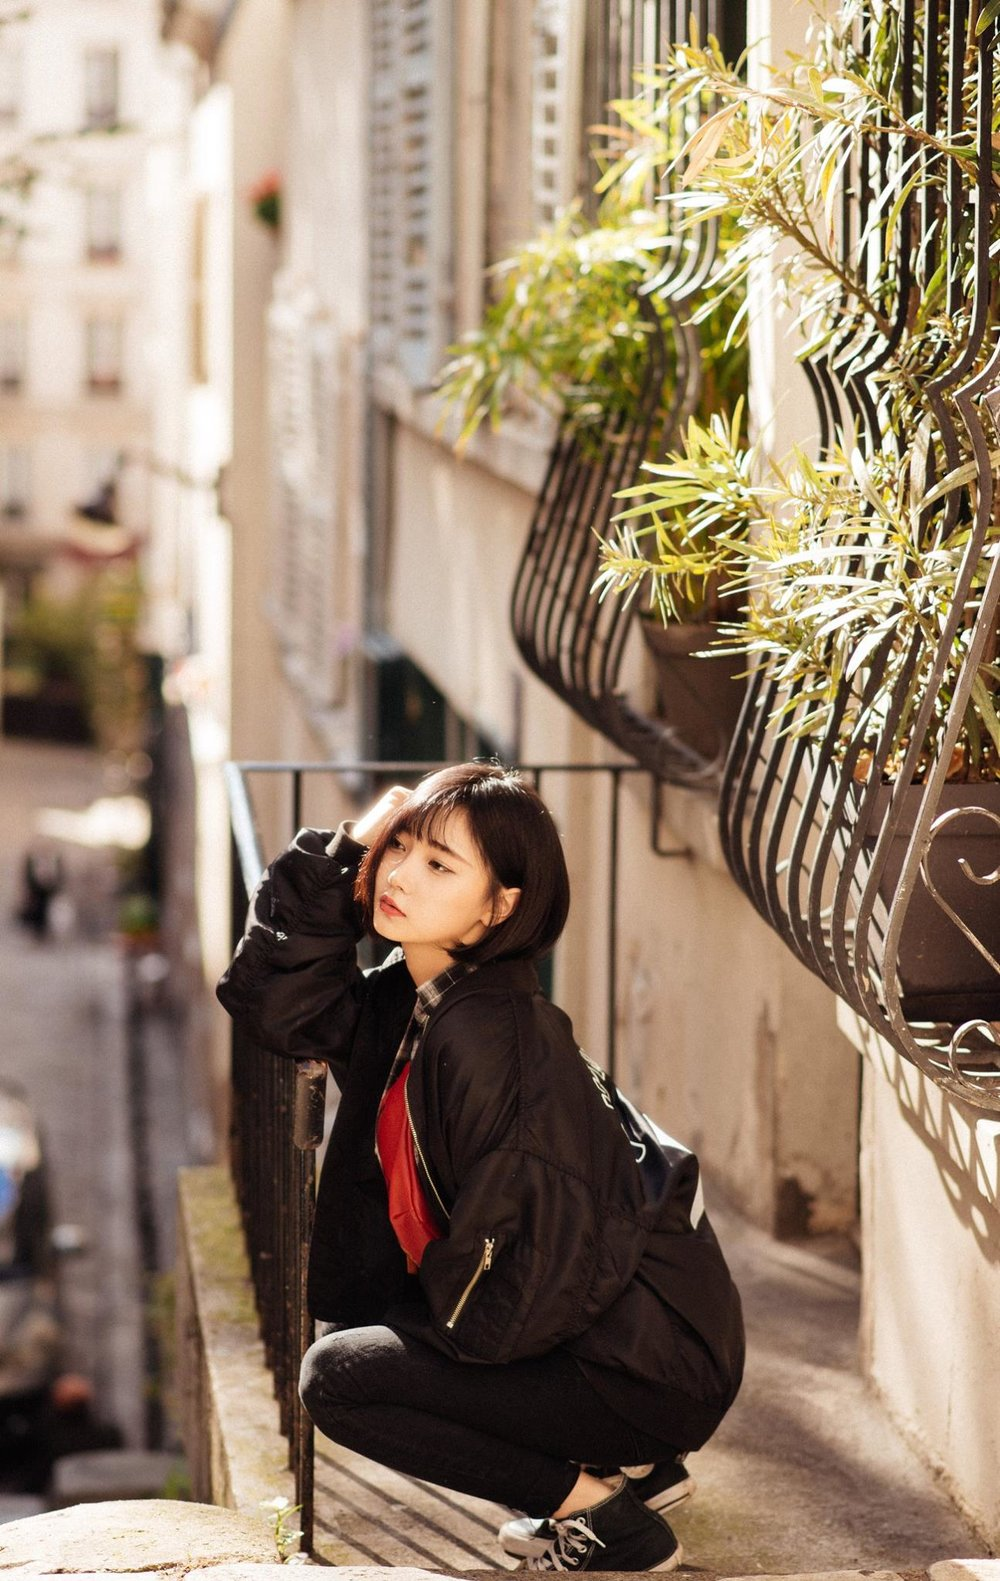 Sprazzi_Professional_Photography_Paris_Taehun30.jpg